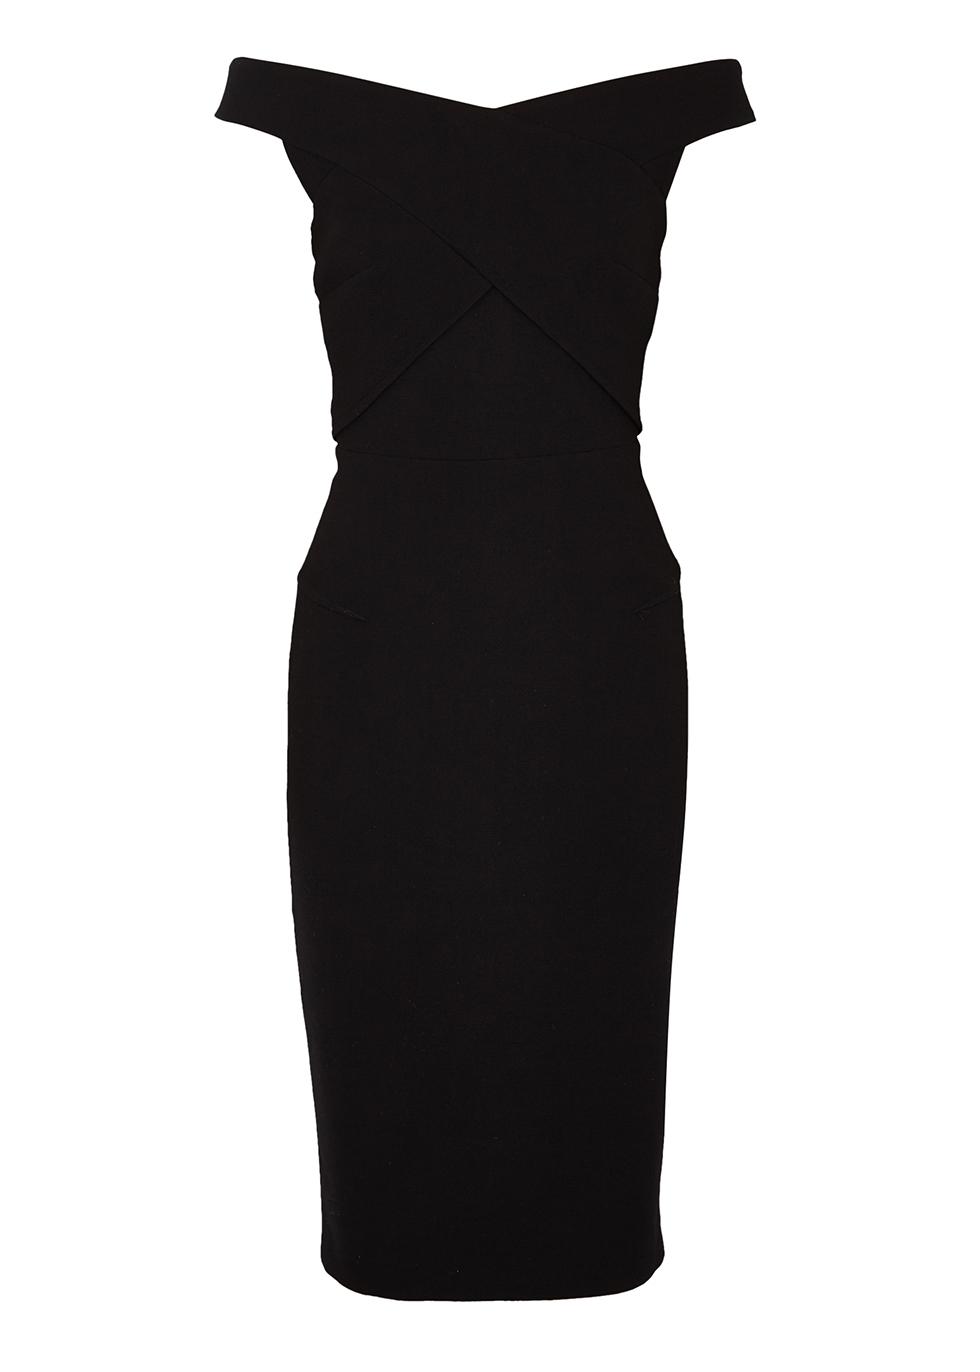 Amarula black off-the-shoulder midi dress